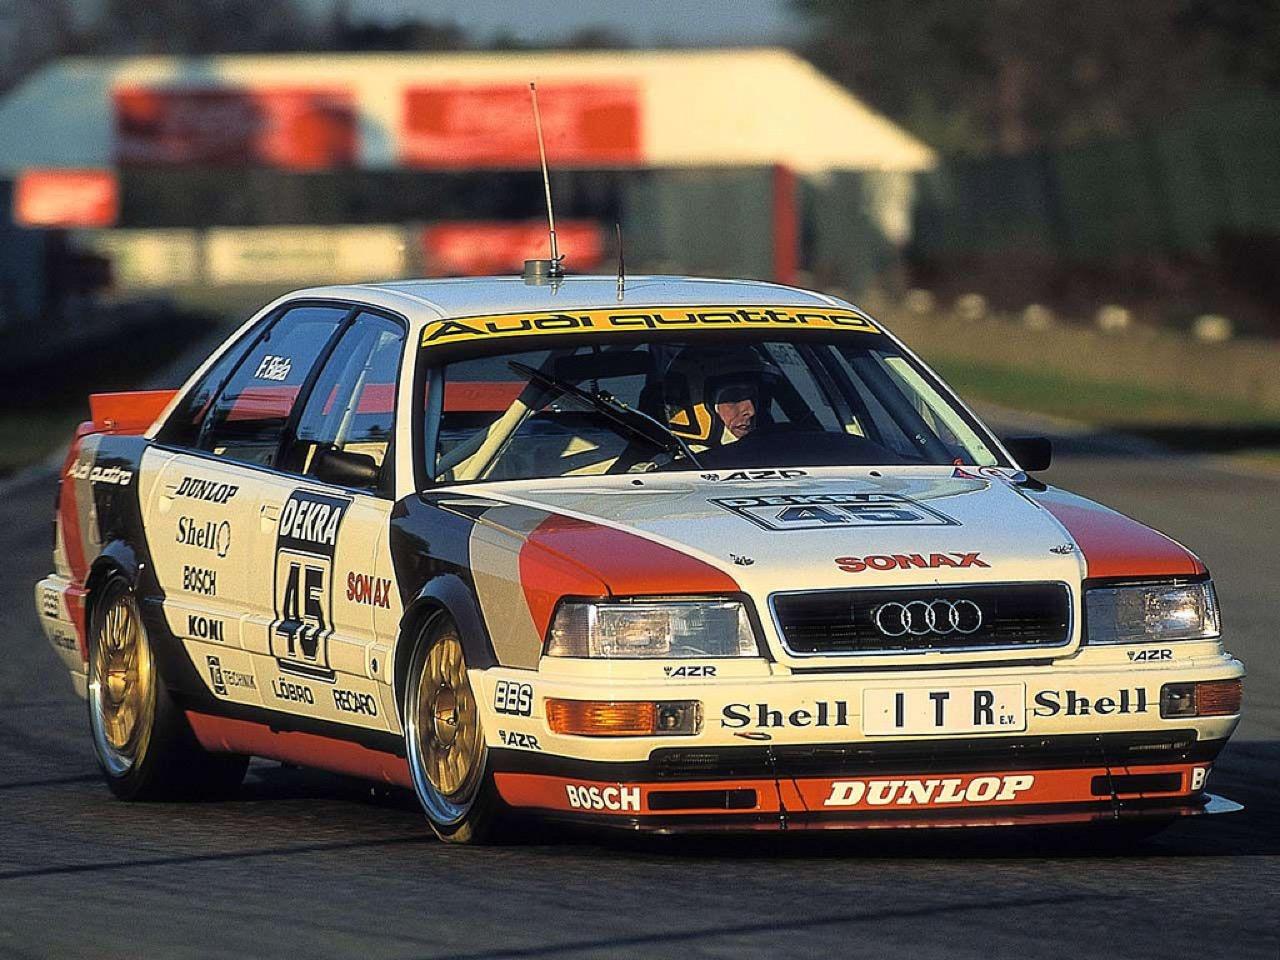 Audi 80 V6 DTM... V6 ? DTM ? C'est quoi c'bordel ?! 29